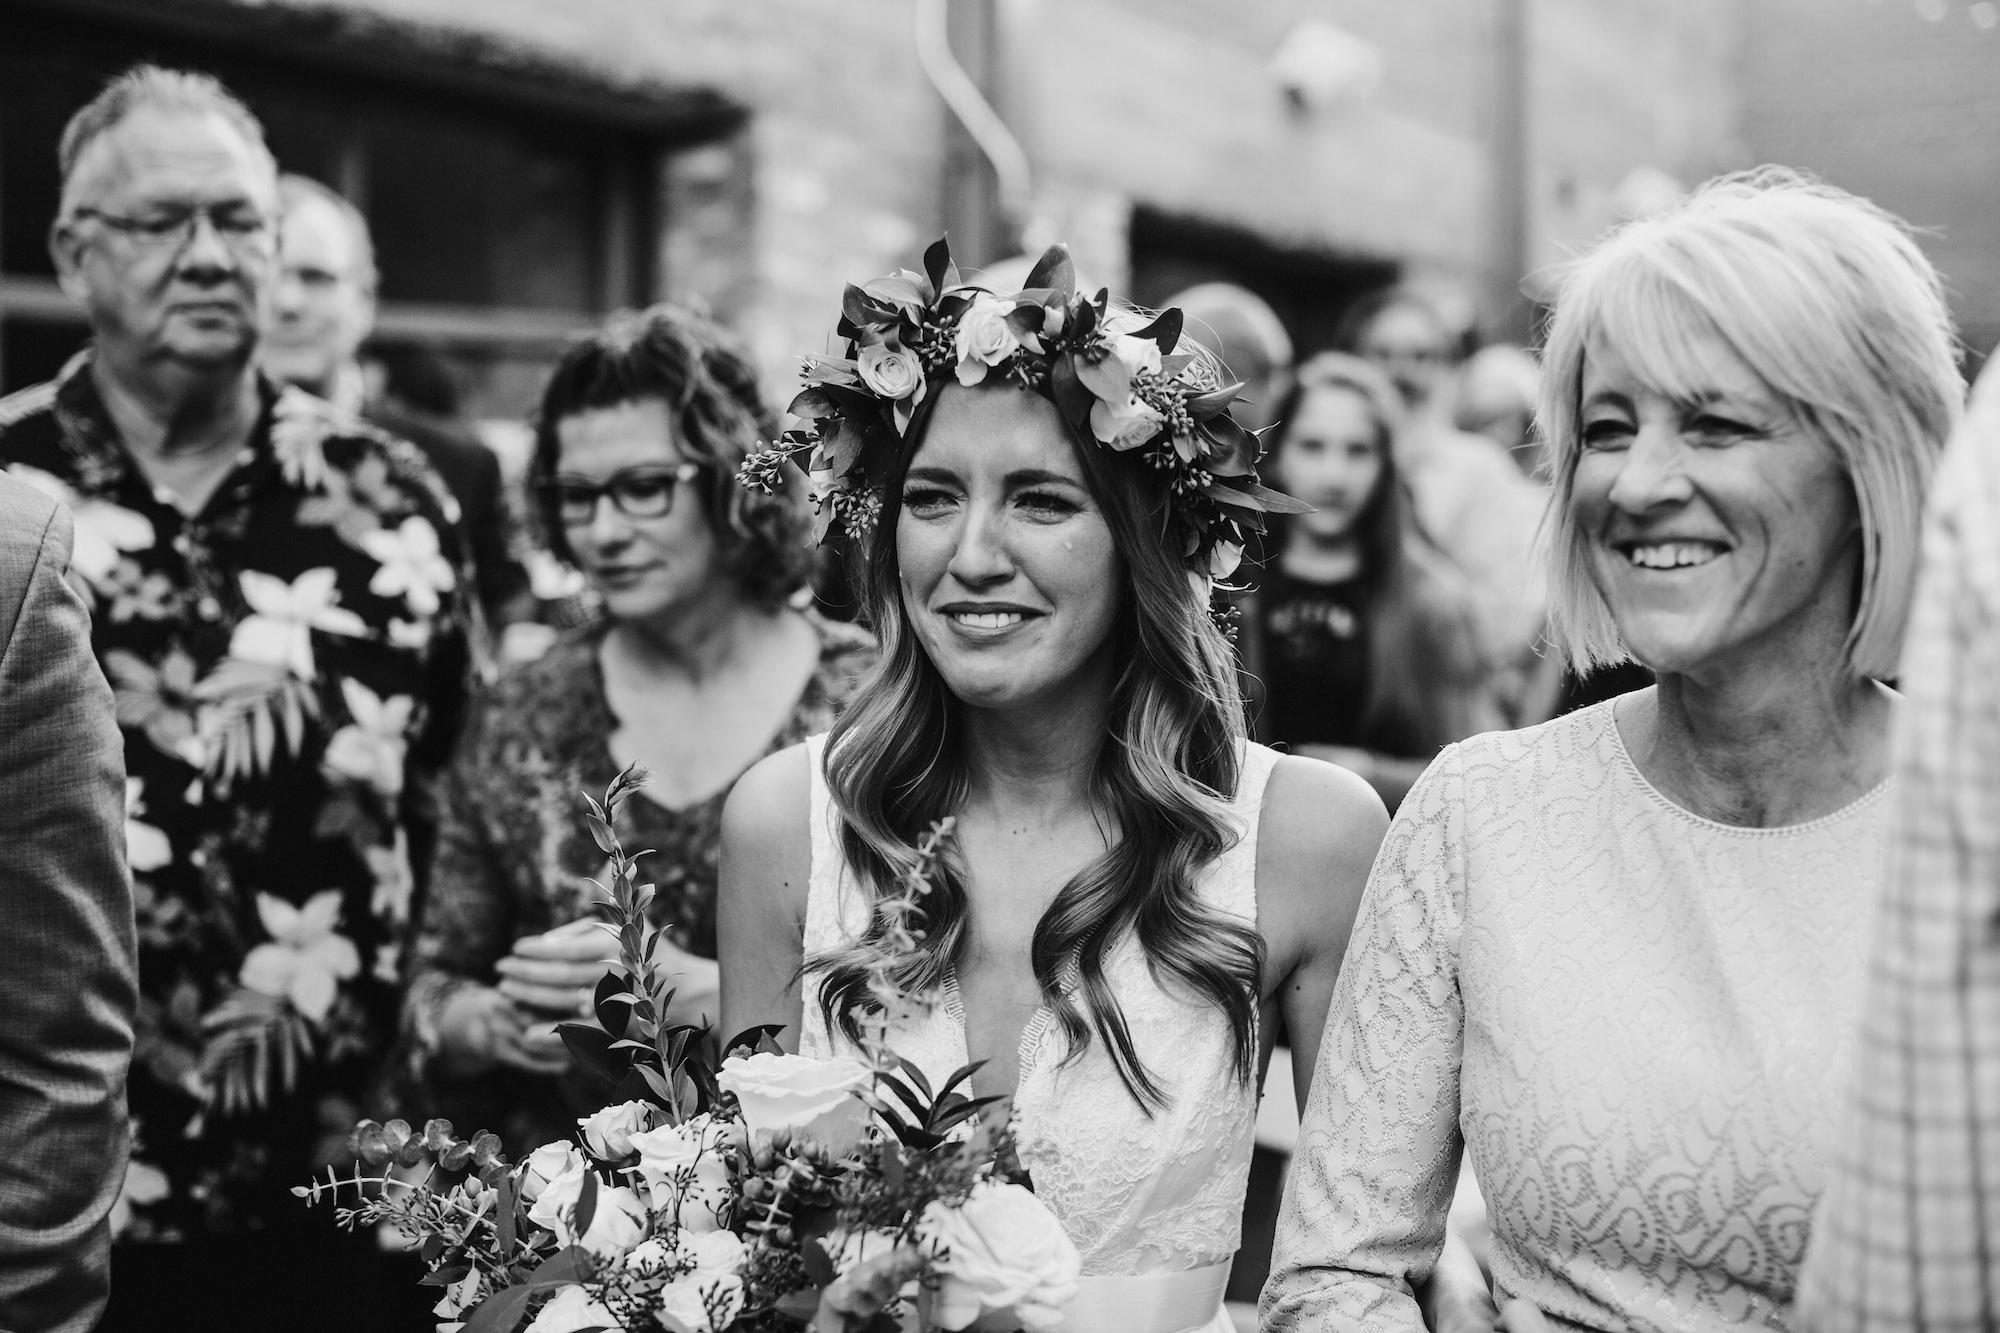 arizona - wedding - photographer 362.jpg